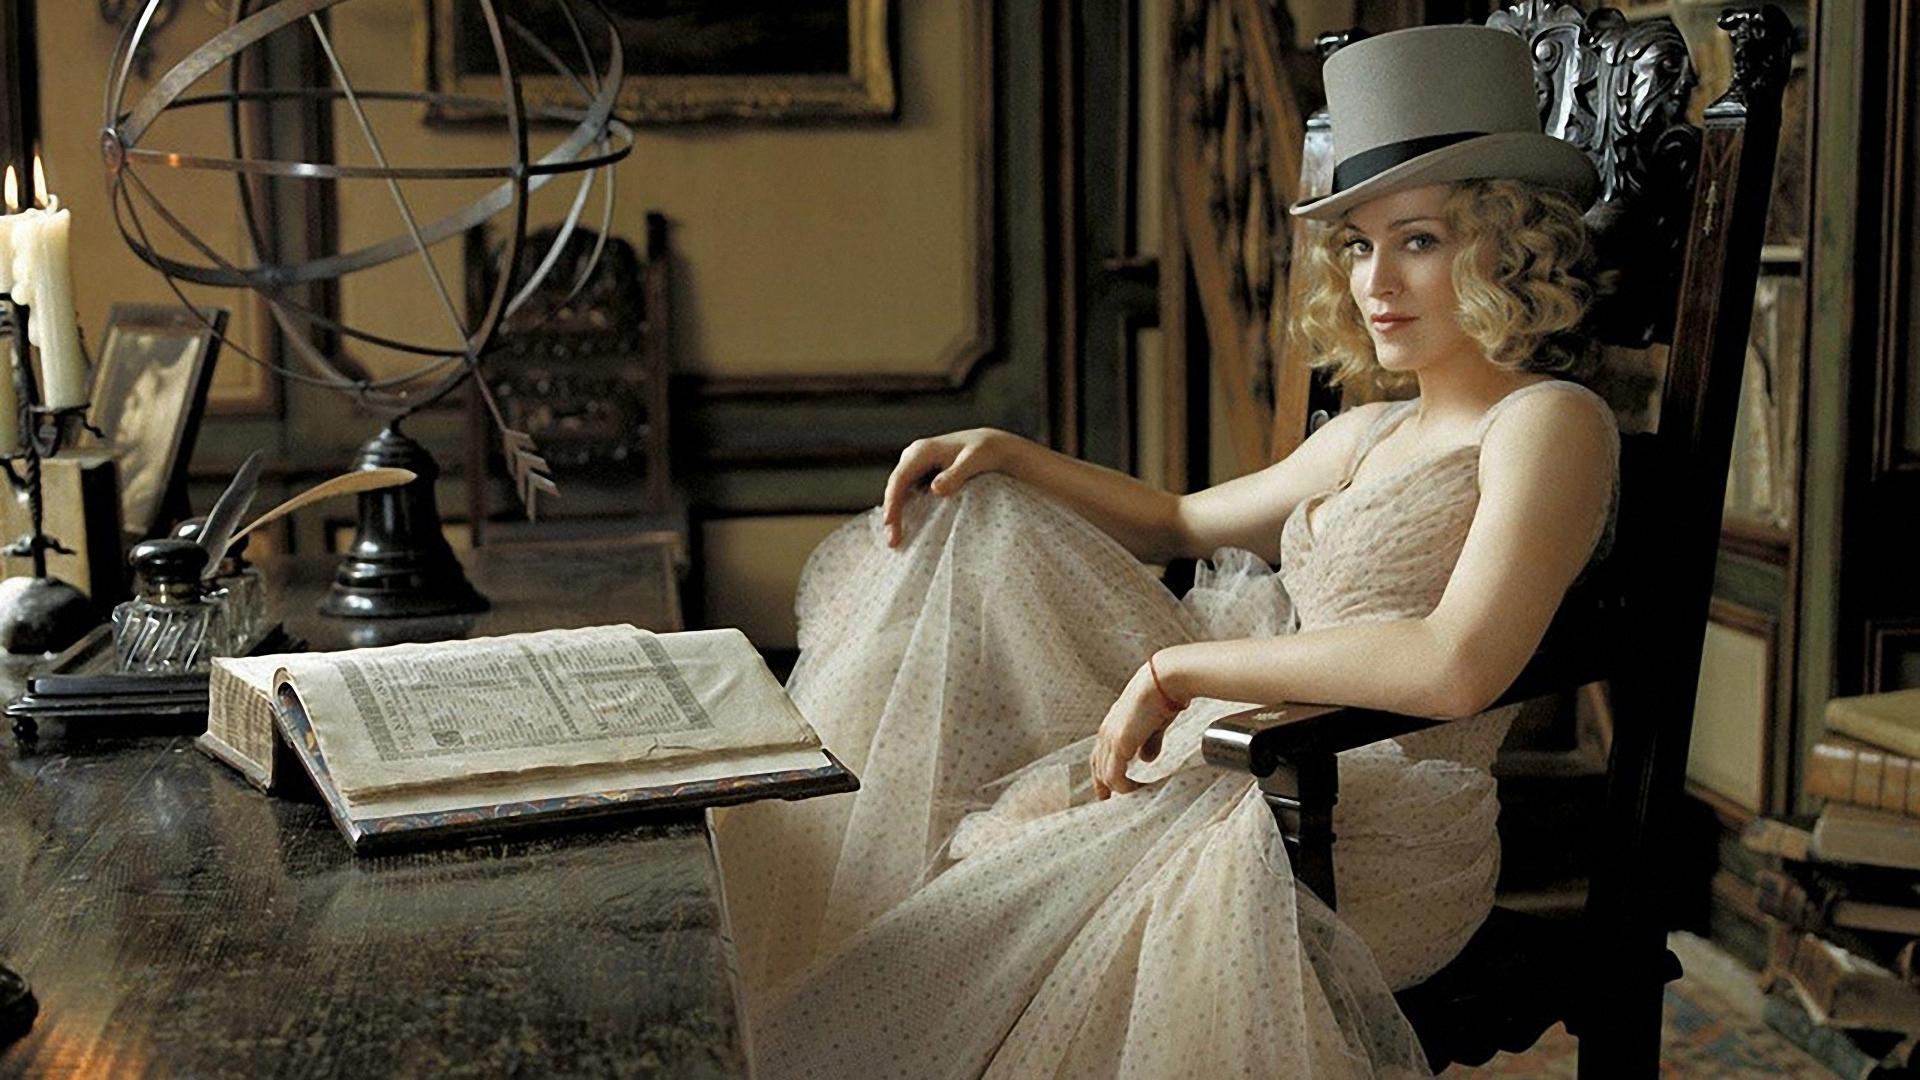 9df3b8d1195f hat dress wedding dress Madonna girl wedding bride book headpiece gown  photo shoot ceremony bridal clothing. 1 1. Download Wallpaper. Report